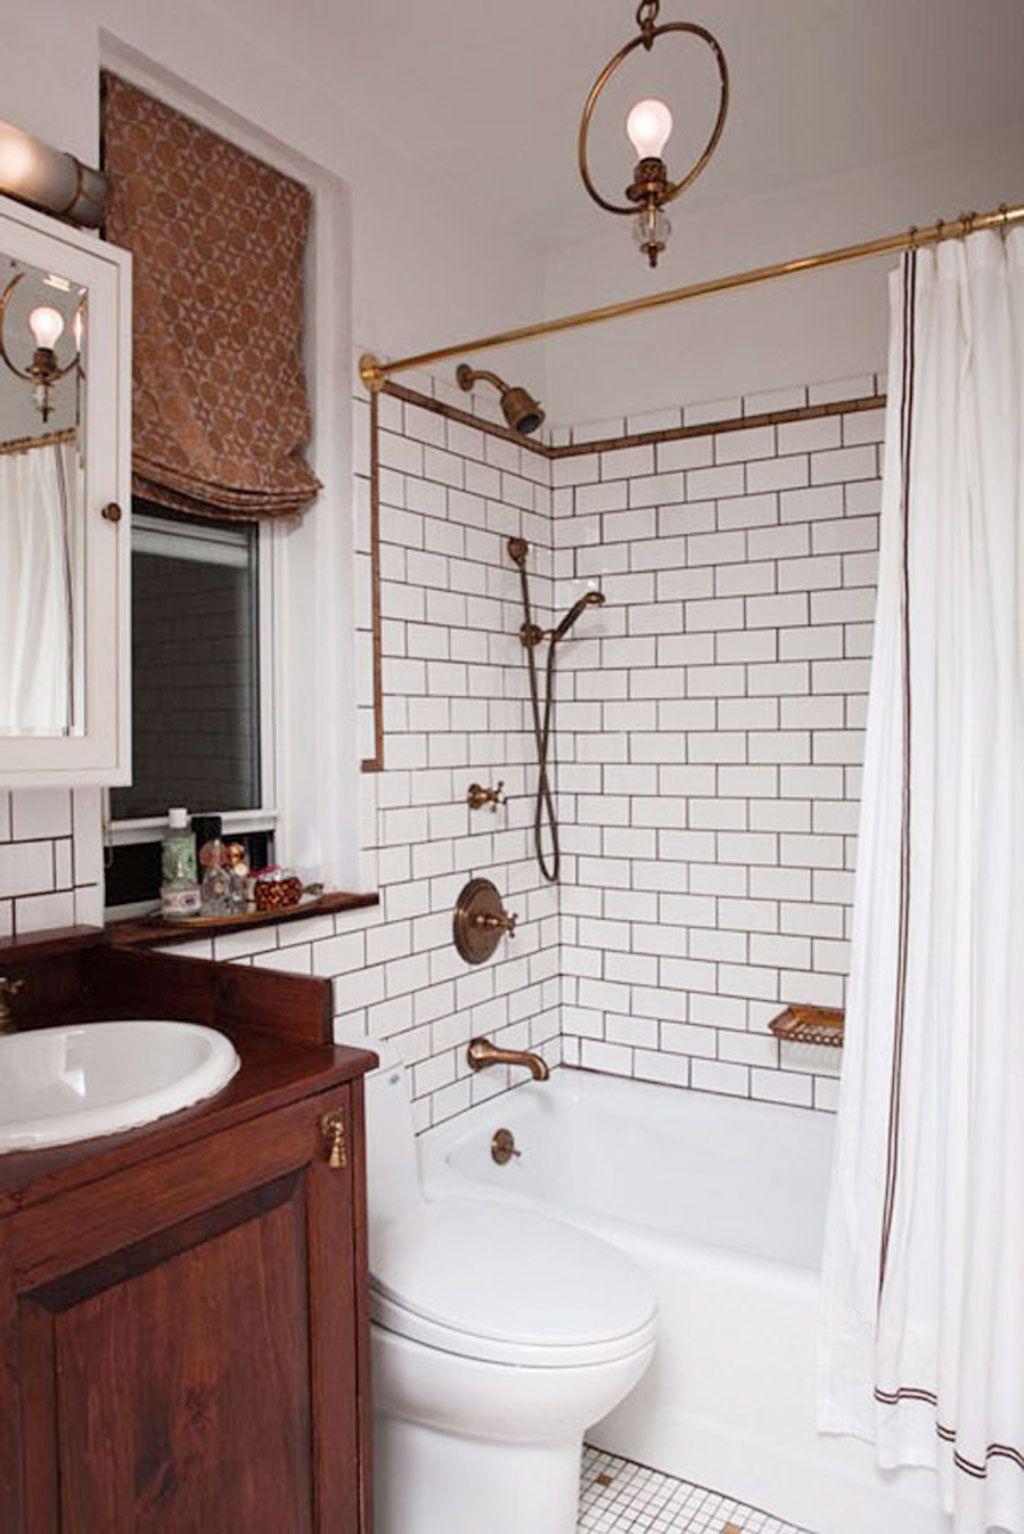 Bathrooms-remodel-ideas-for-small-bathrooms-015, Photo Bathrooms ...